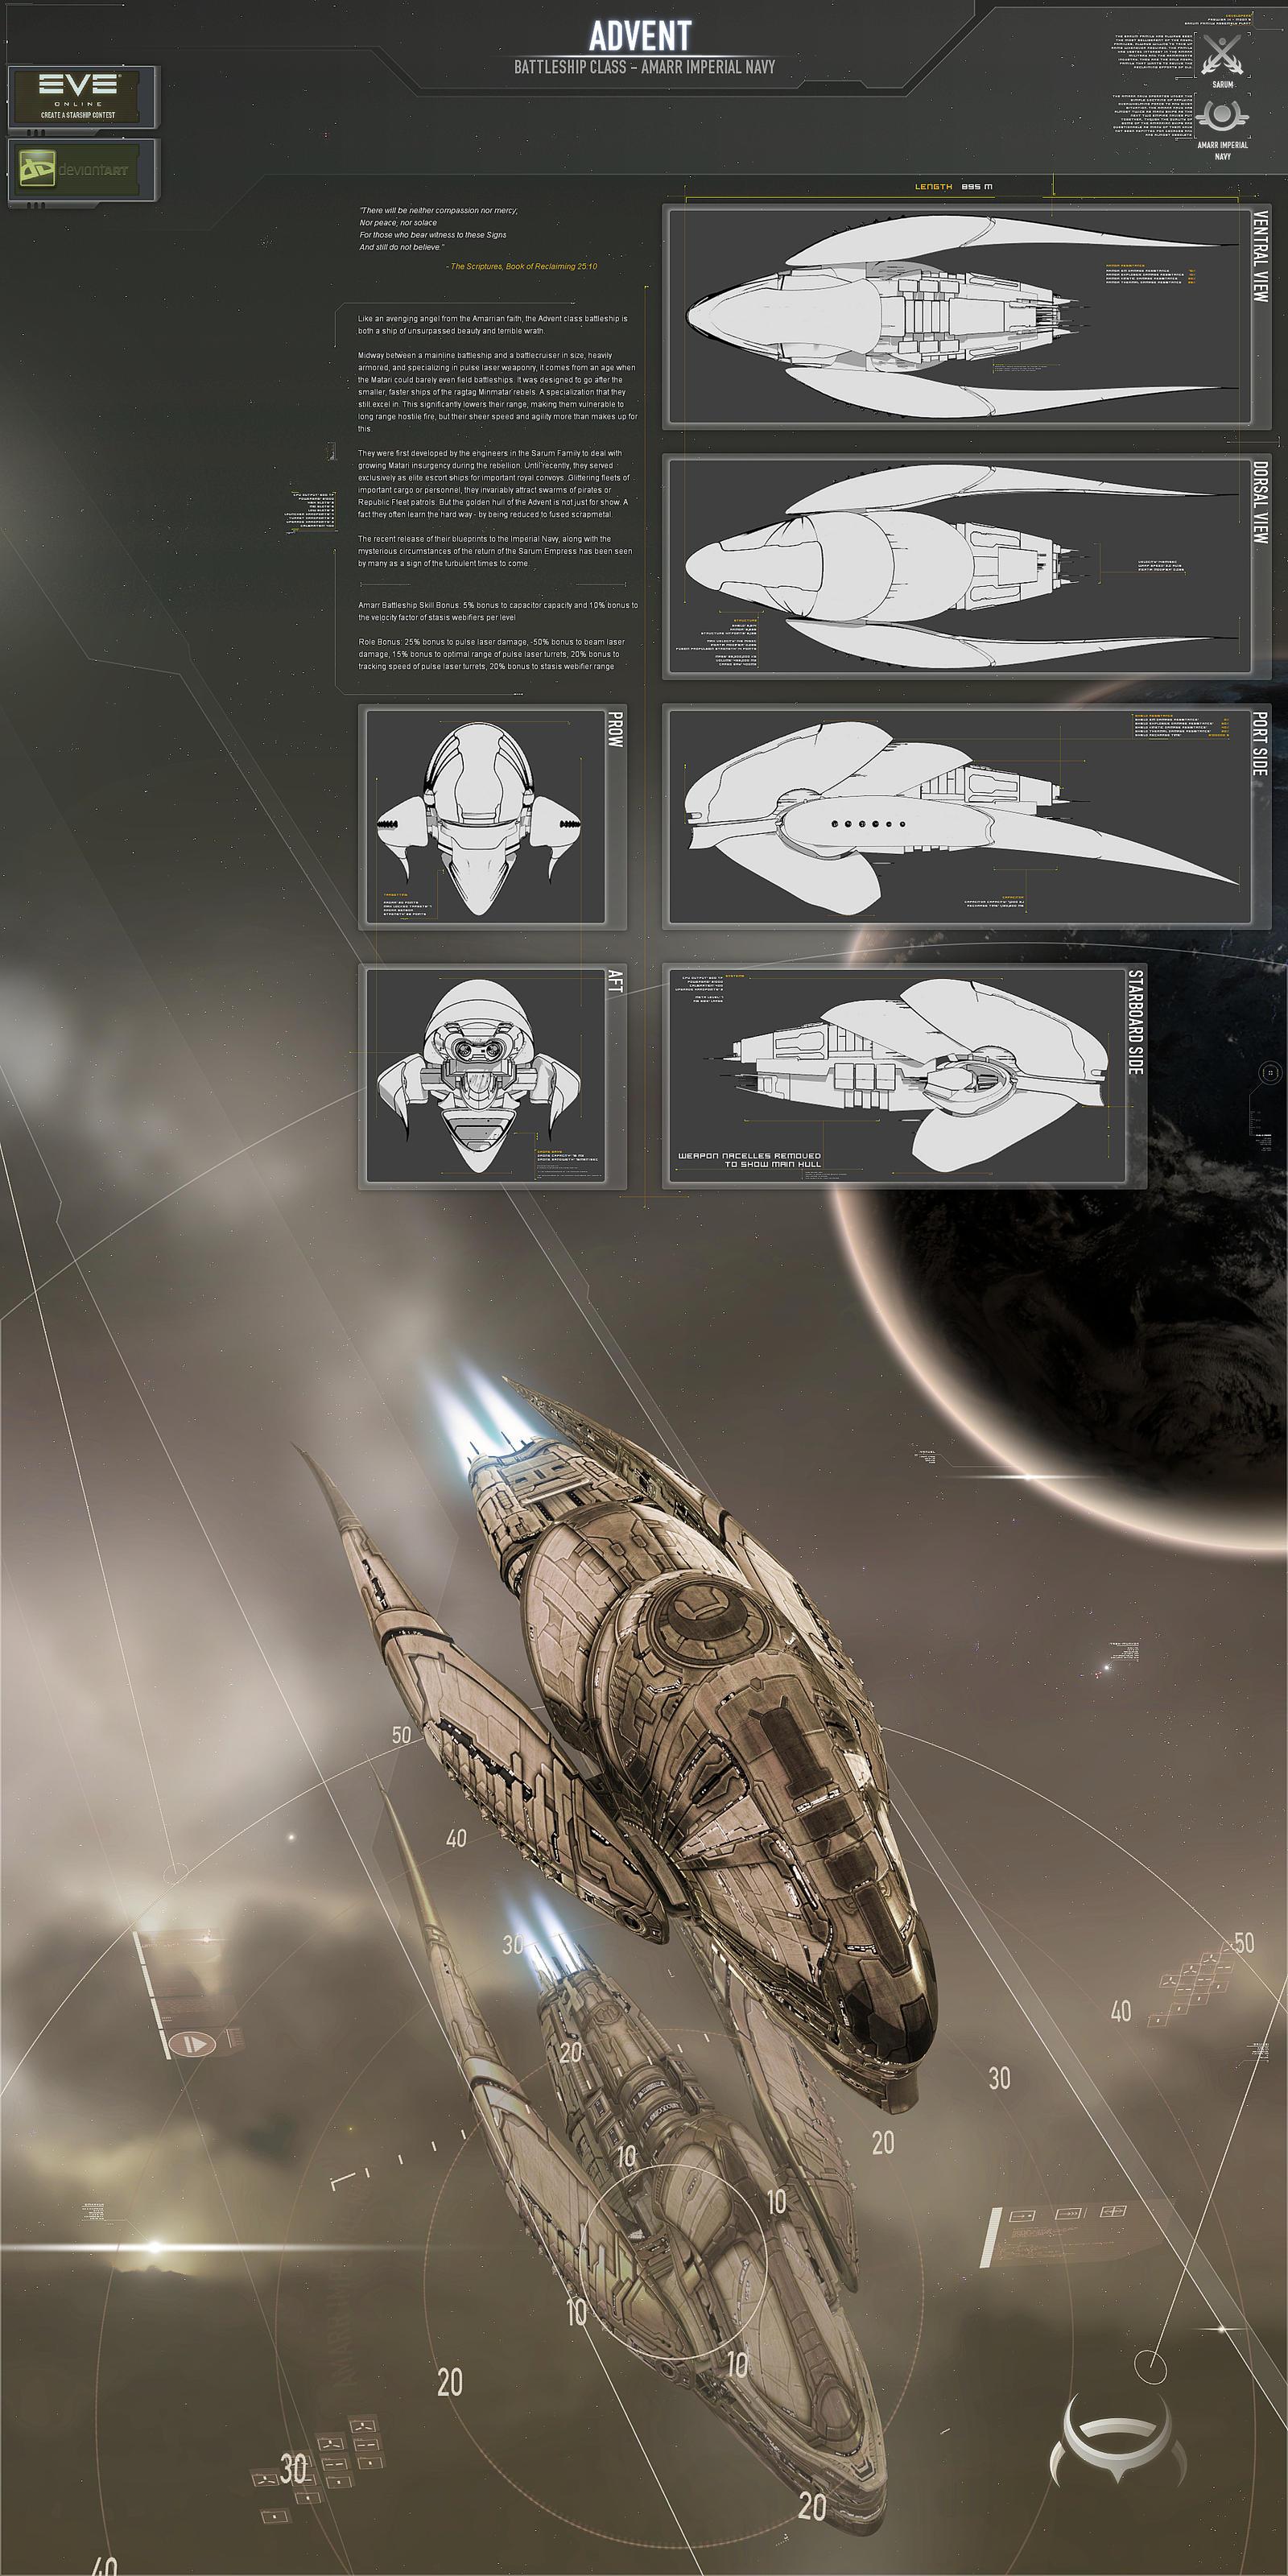 Advent Battleship by AStepIntoOblivion